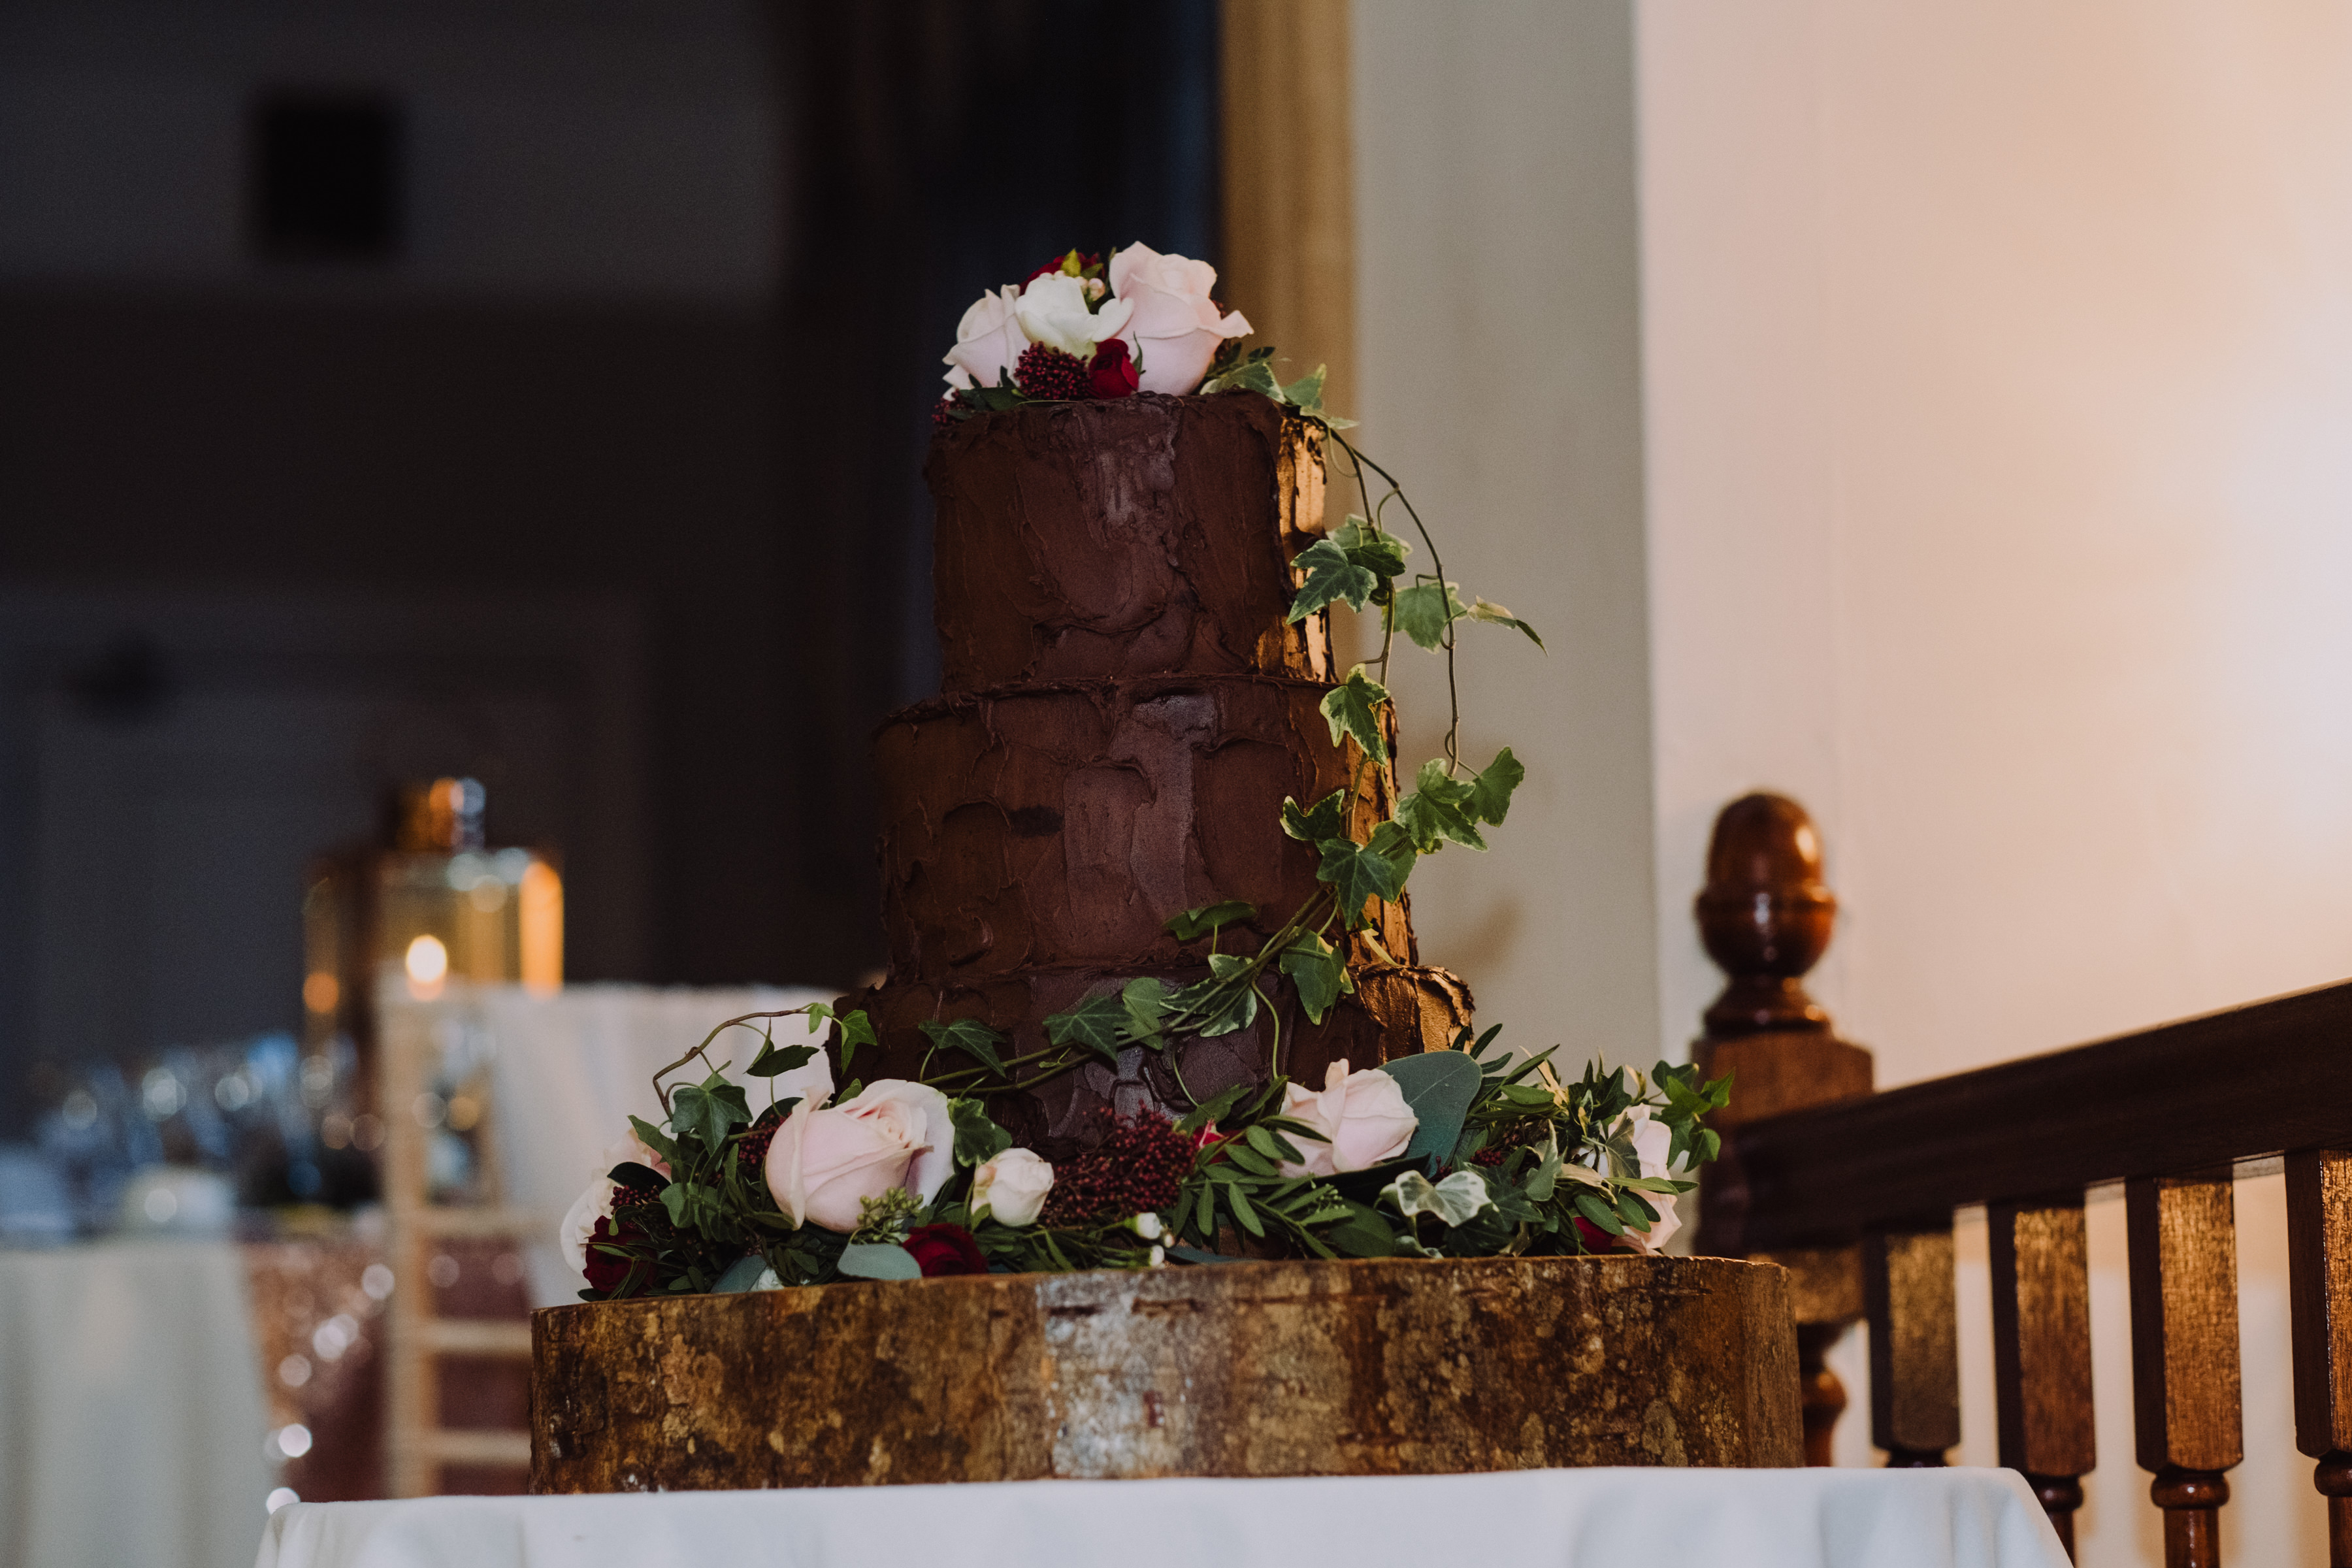 Dark chocolate ganached wedding cake